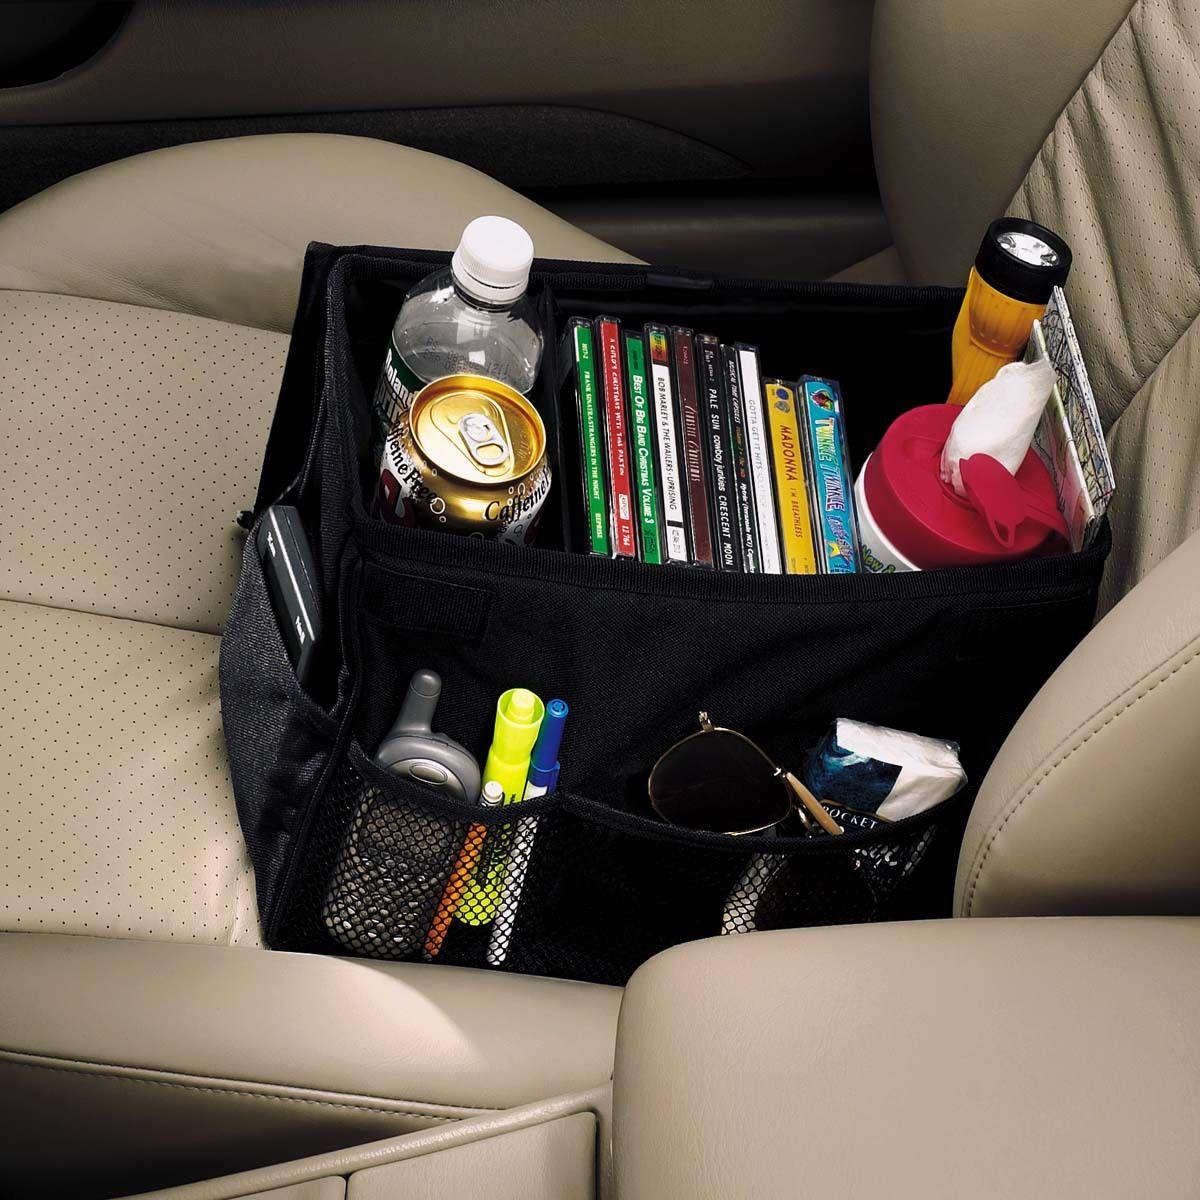 Stylish Carganizer Front Seat Organizer